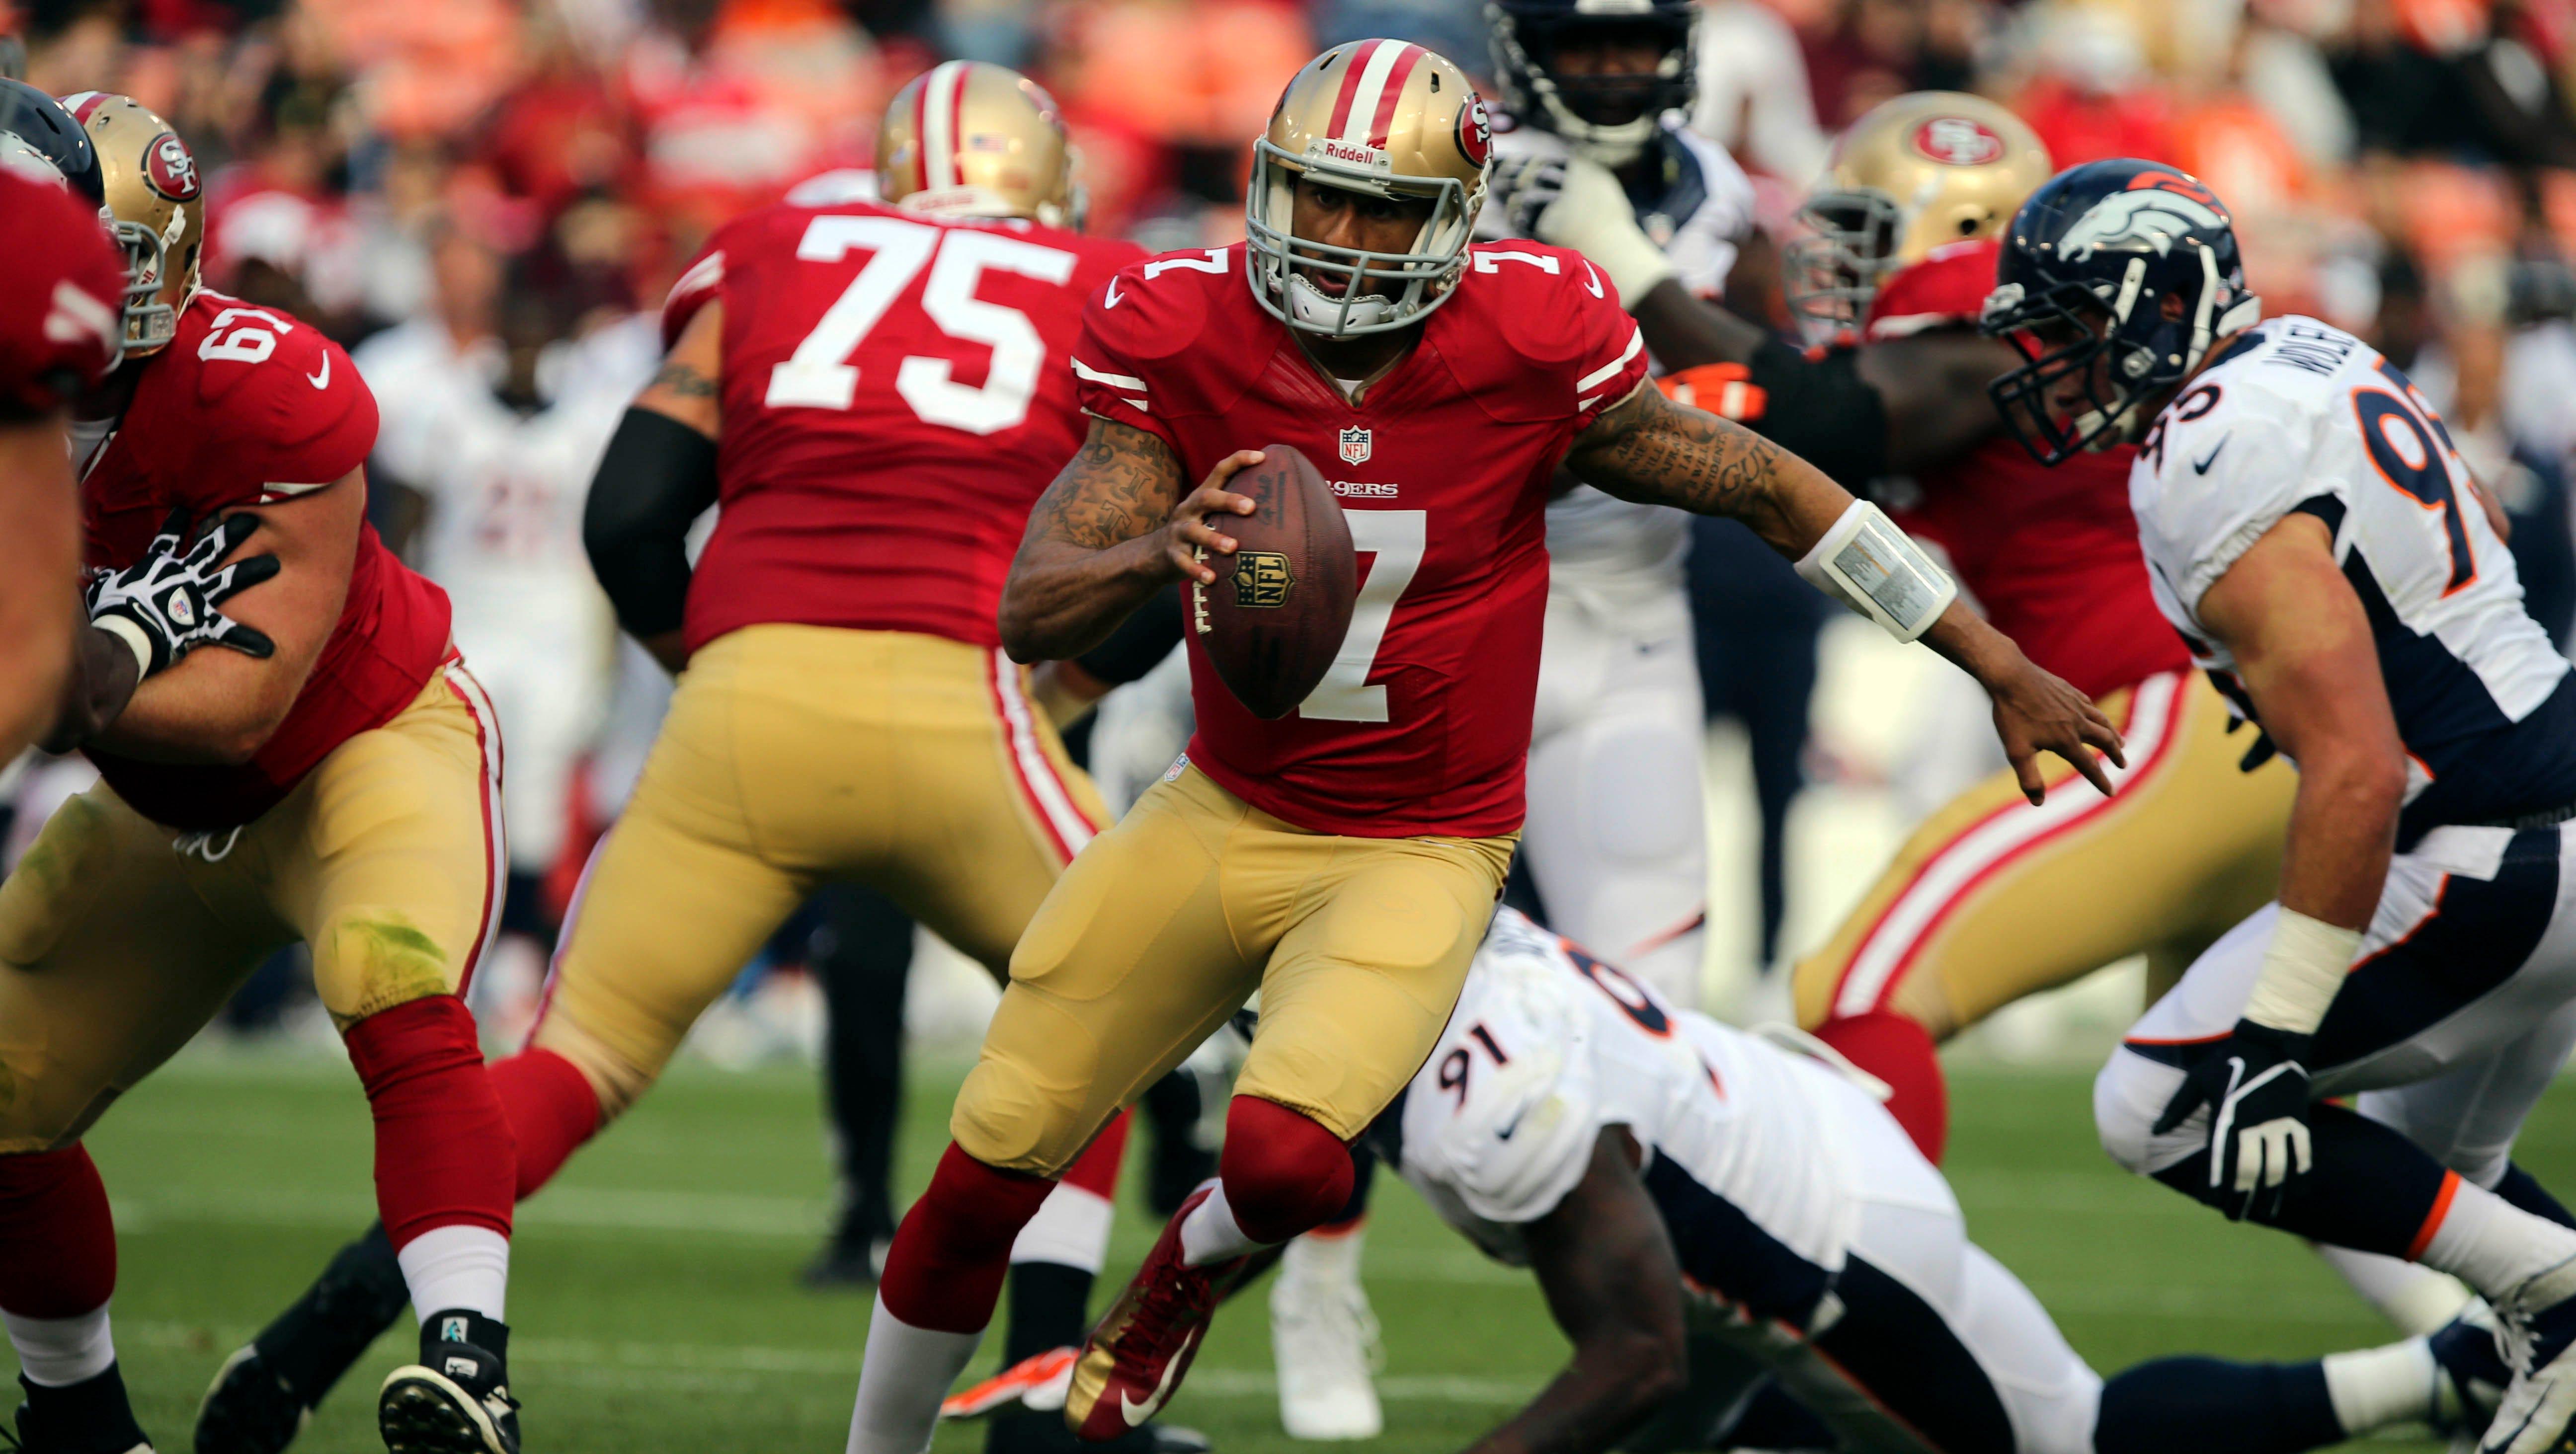 San Francisco 49ers quarterback Colin Kaepernick (7) runs against the Denver Broncos at Candlestick Park.